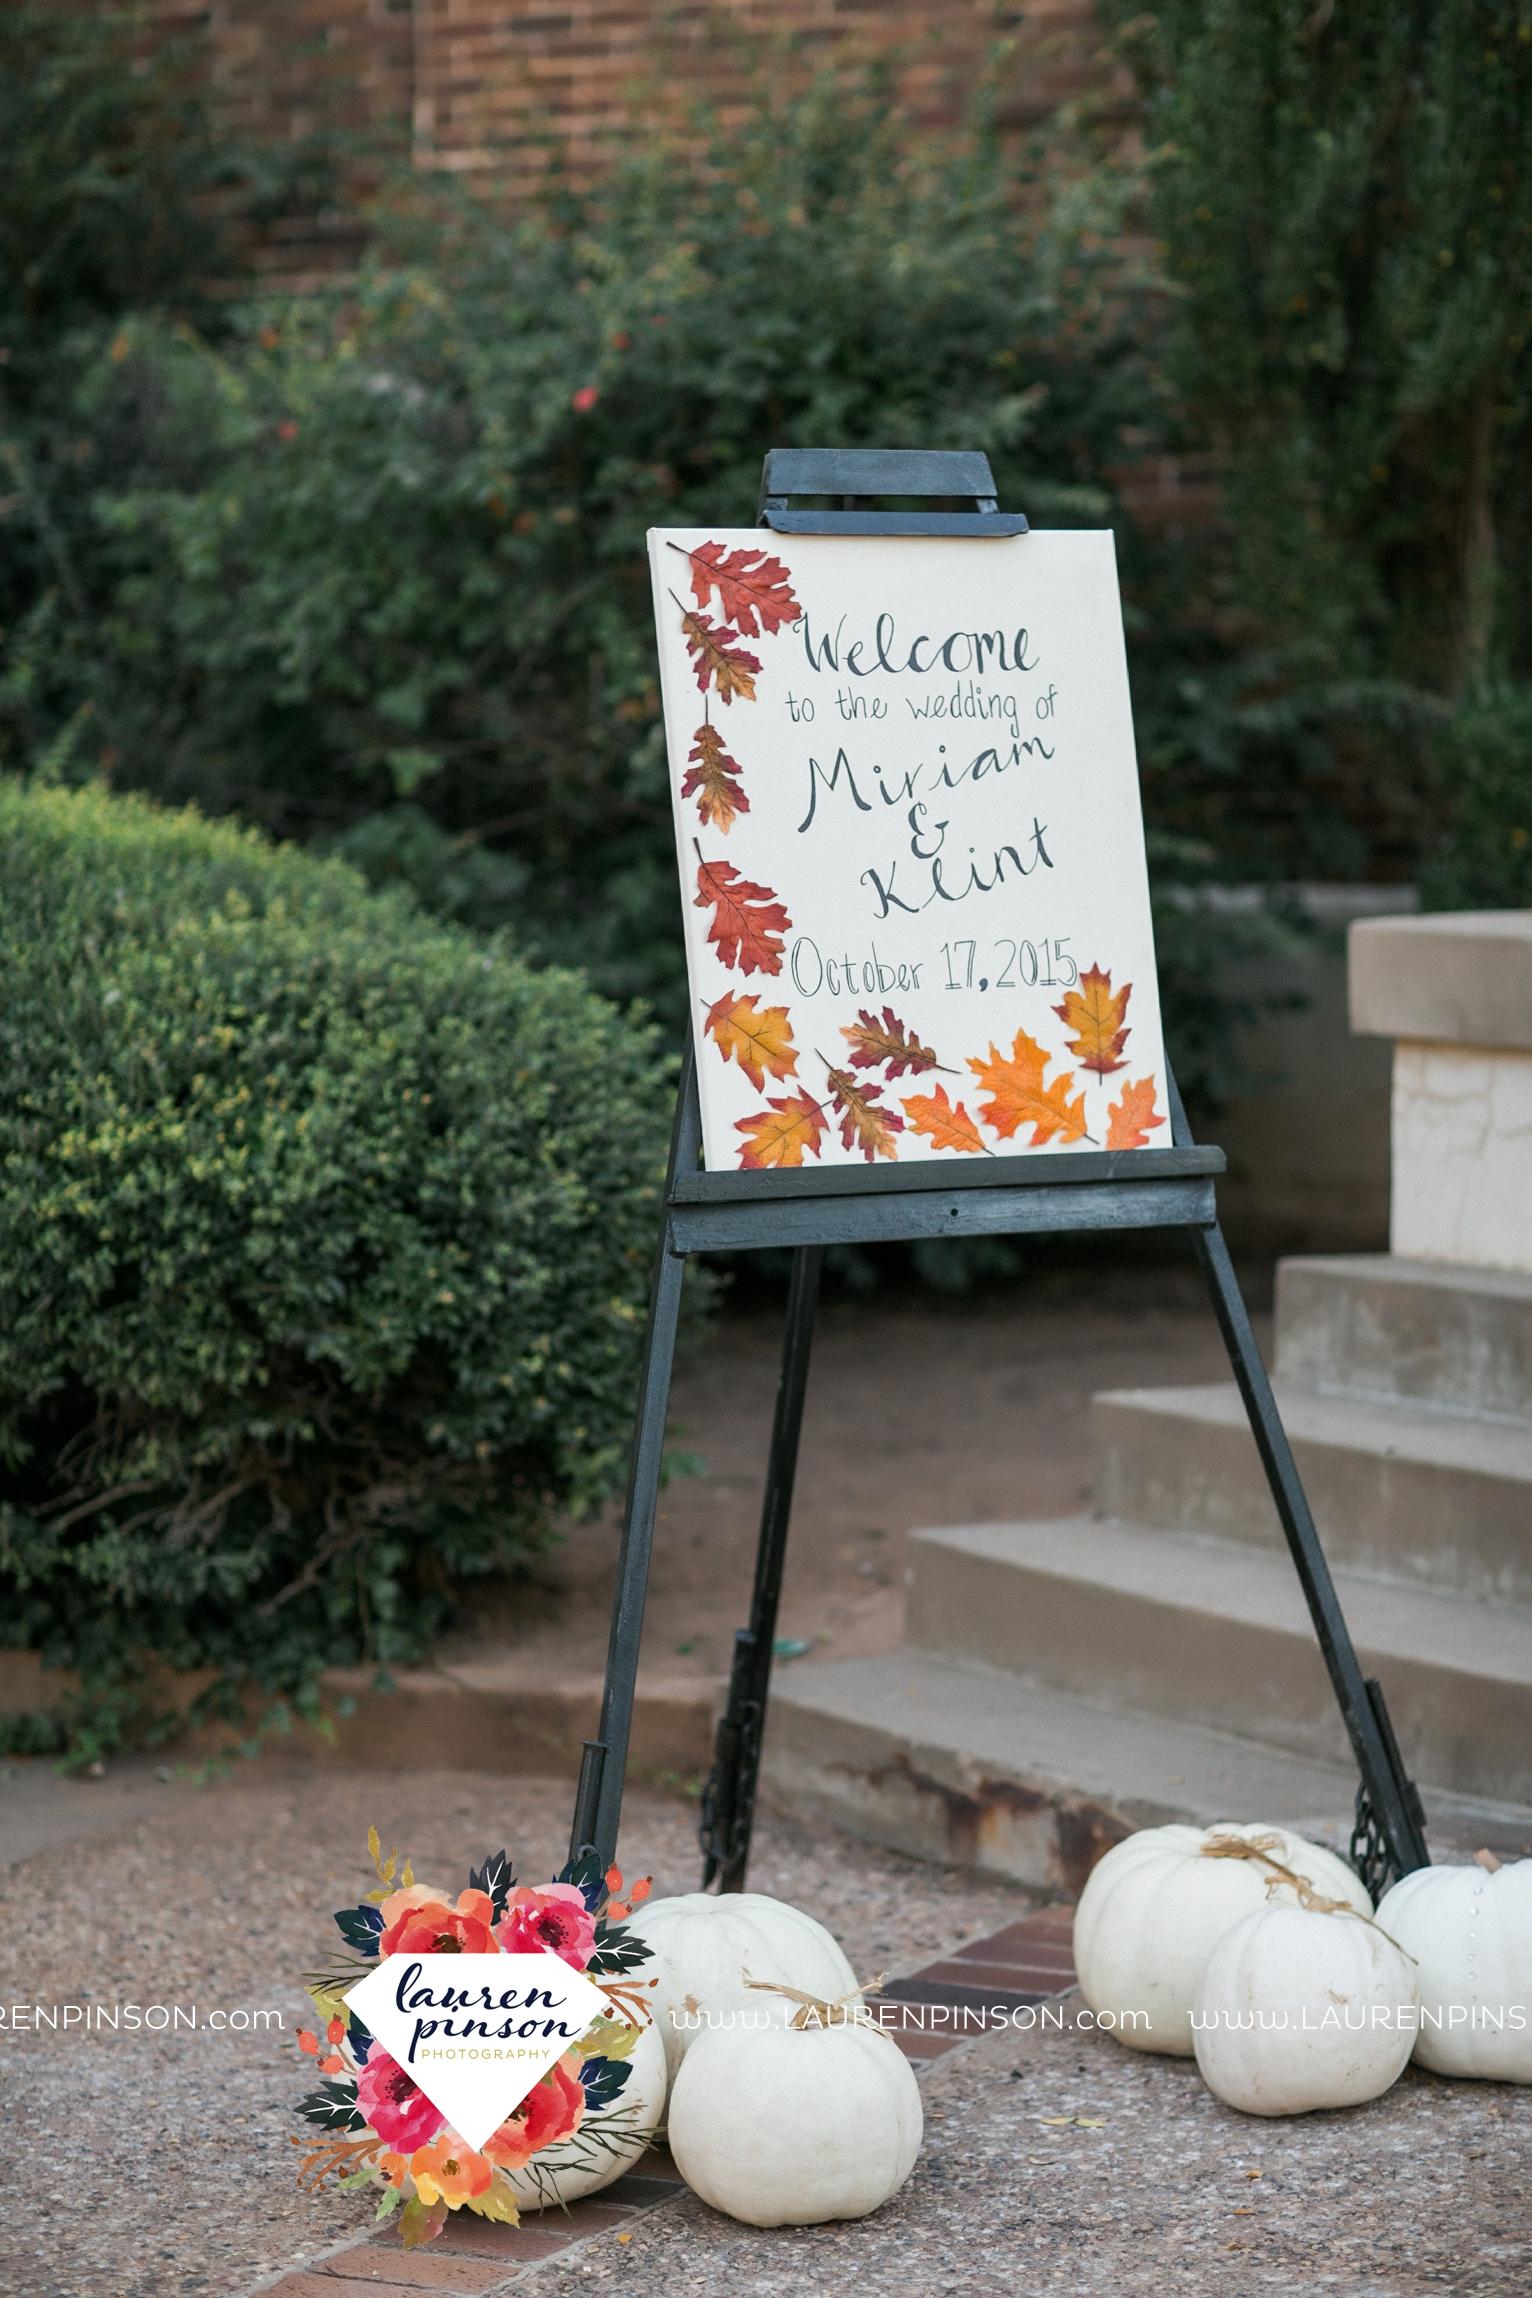 kemp-center-for-the-arts-wichita-falls-texas-wedding-photographer-fall-wedding-pumpkins-164.jpg